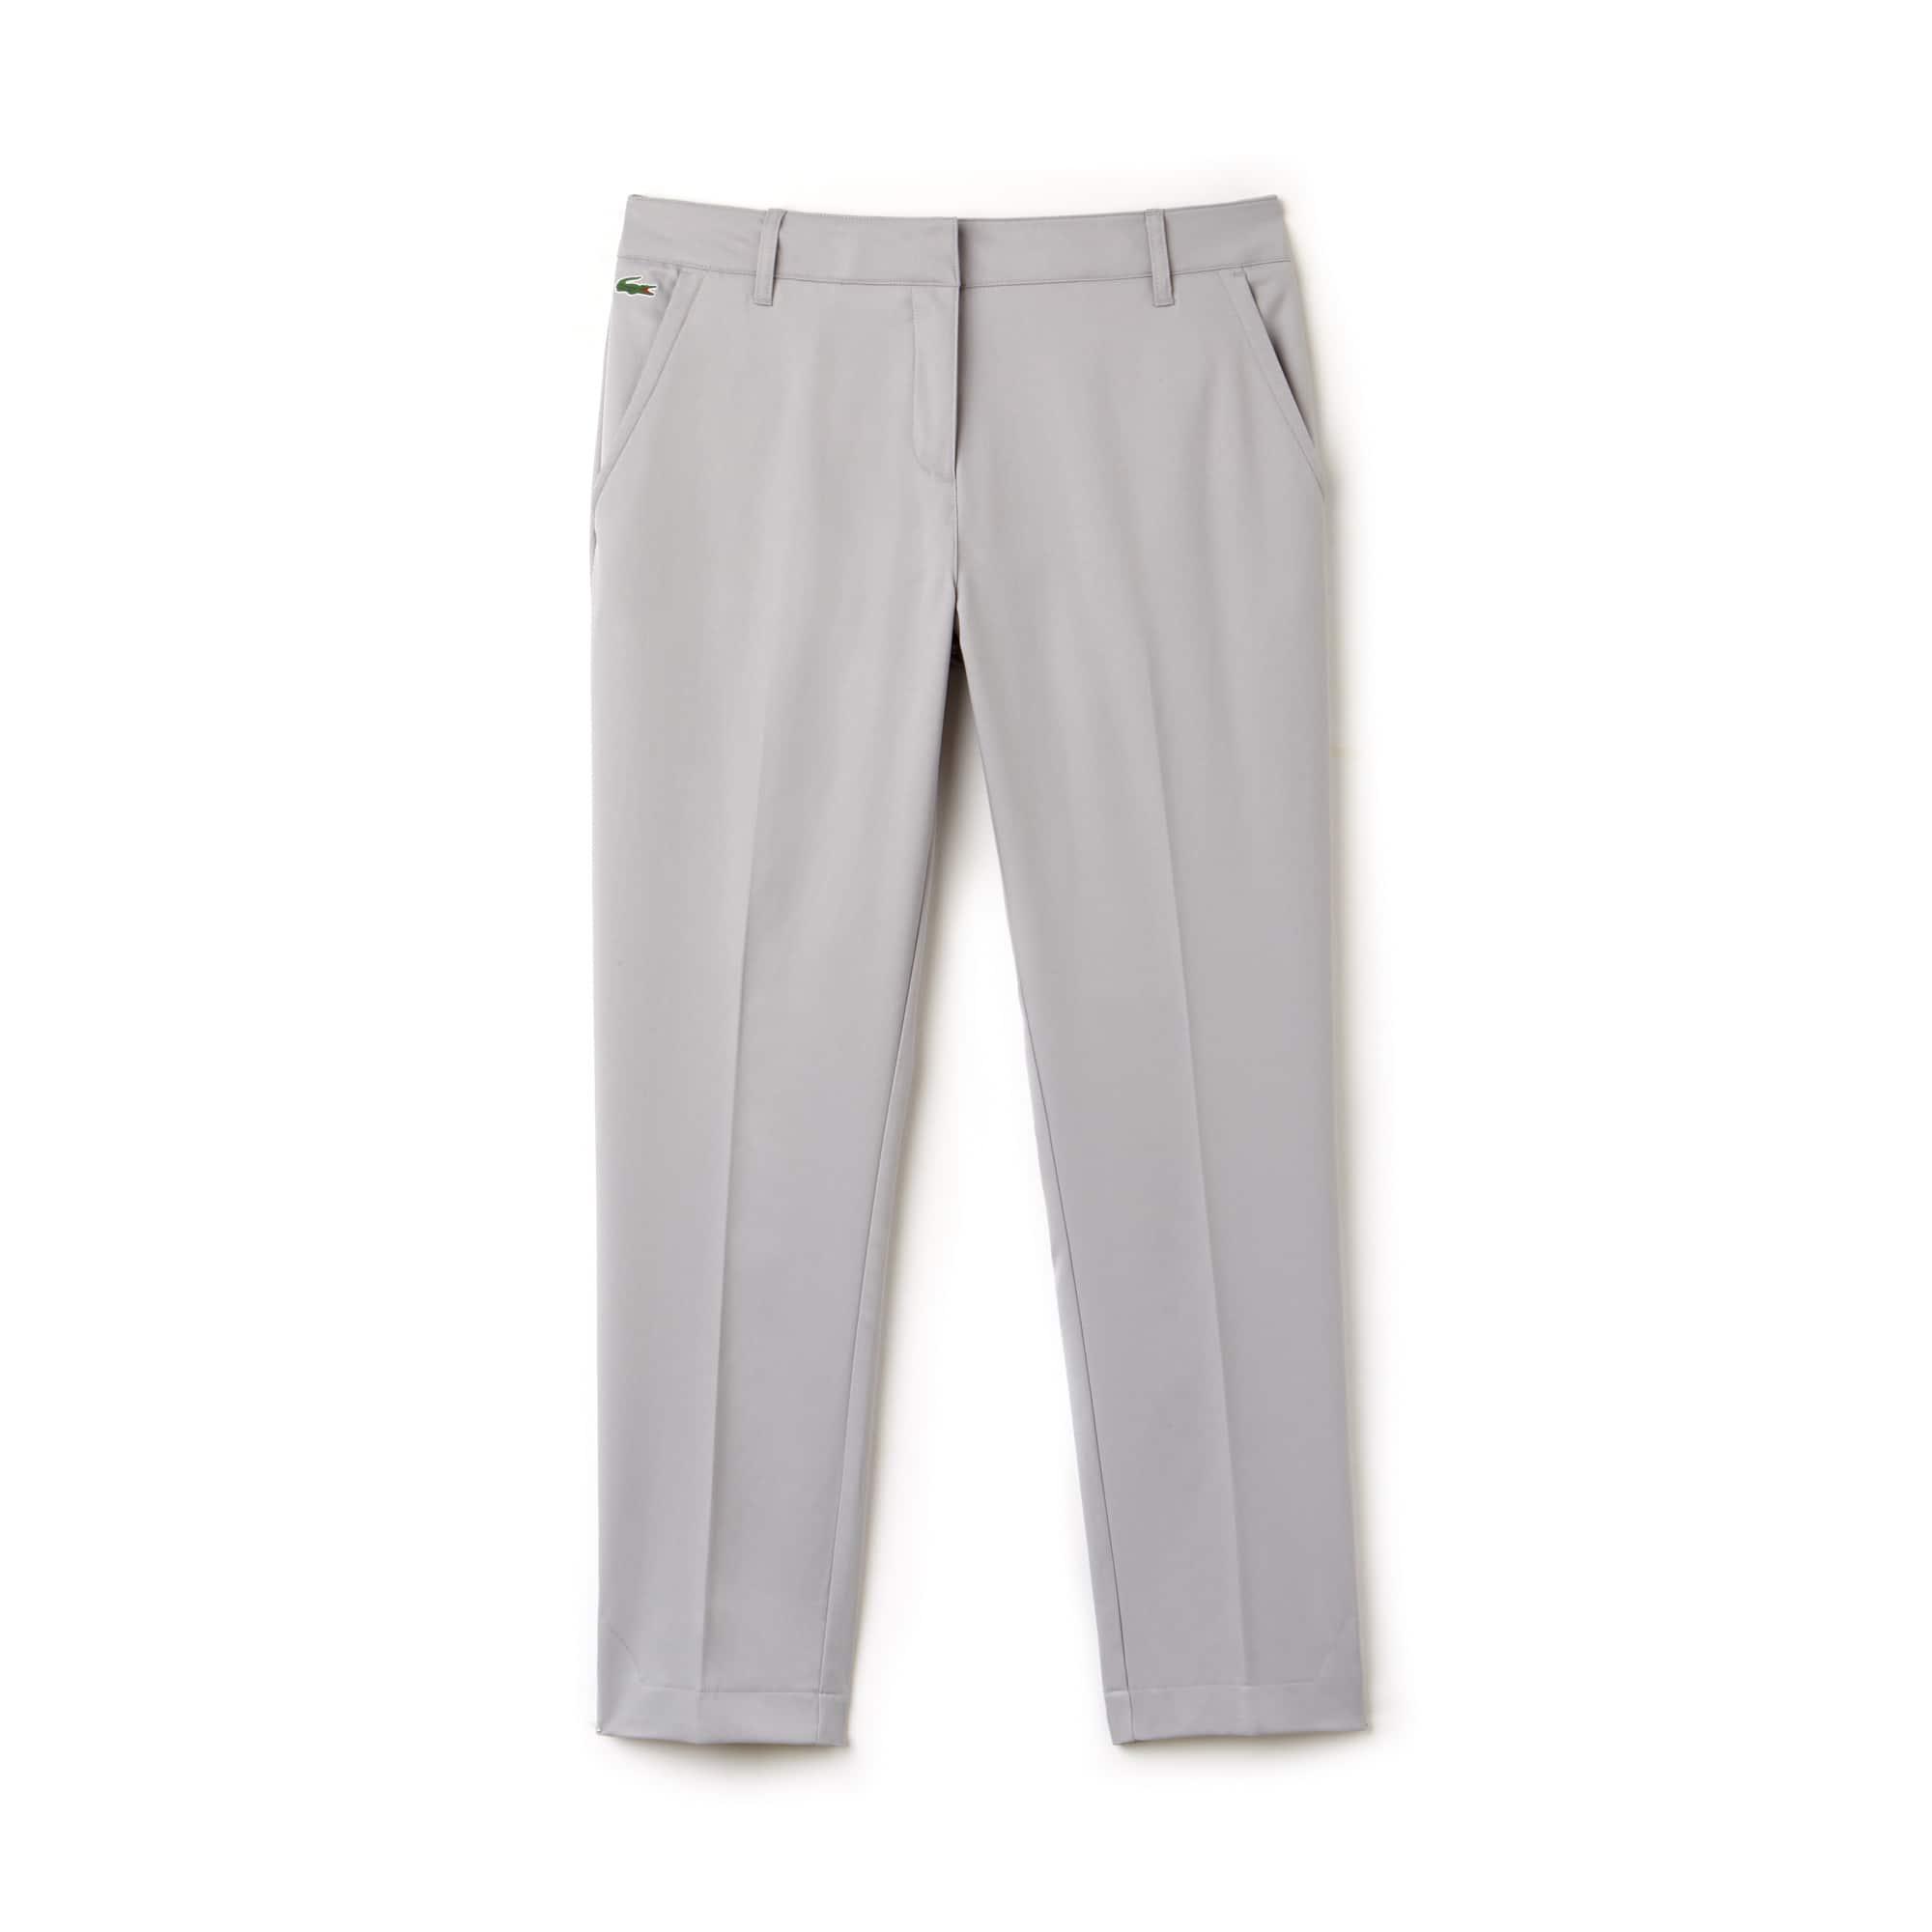 Women's Lacoste SPORT Ryder Cup Edition Pleated Tech Gabardine Golf Pants